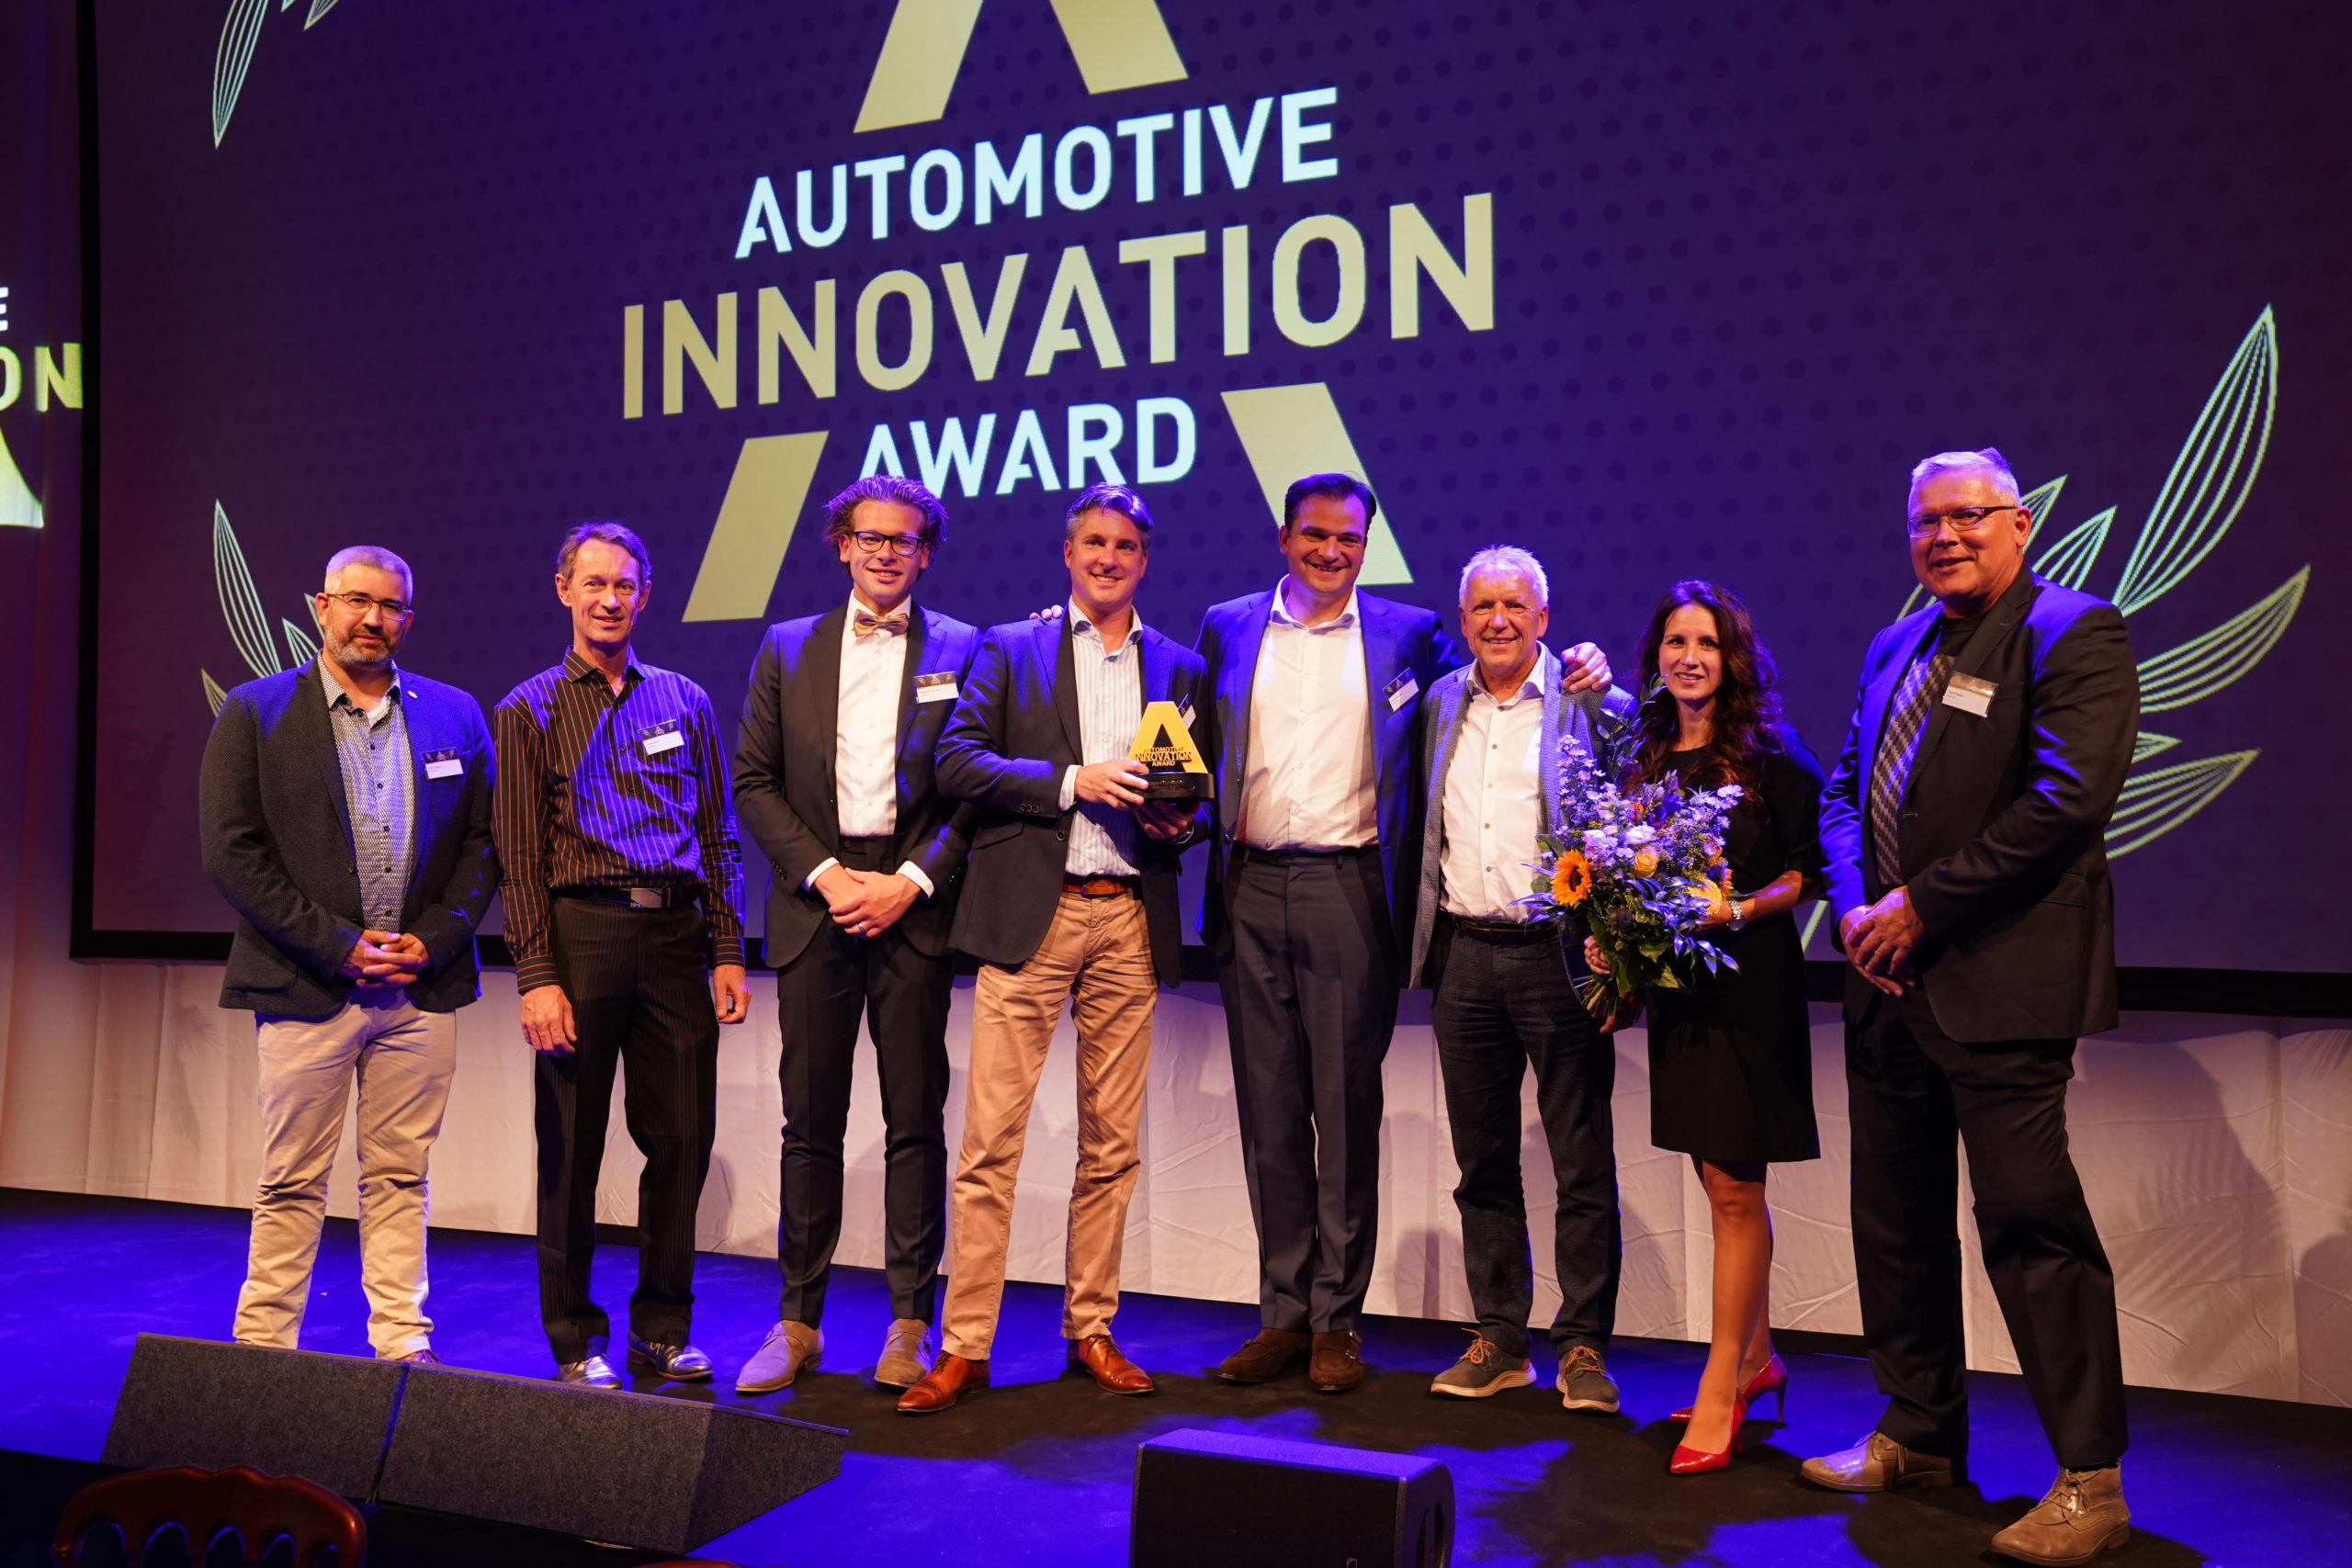 Ebusco Automotive Innovation Award